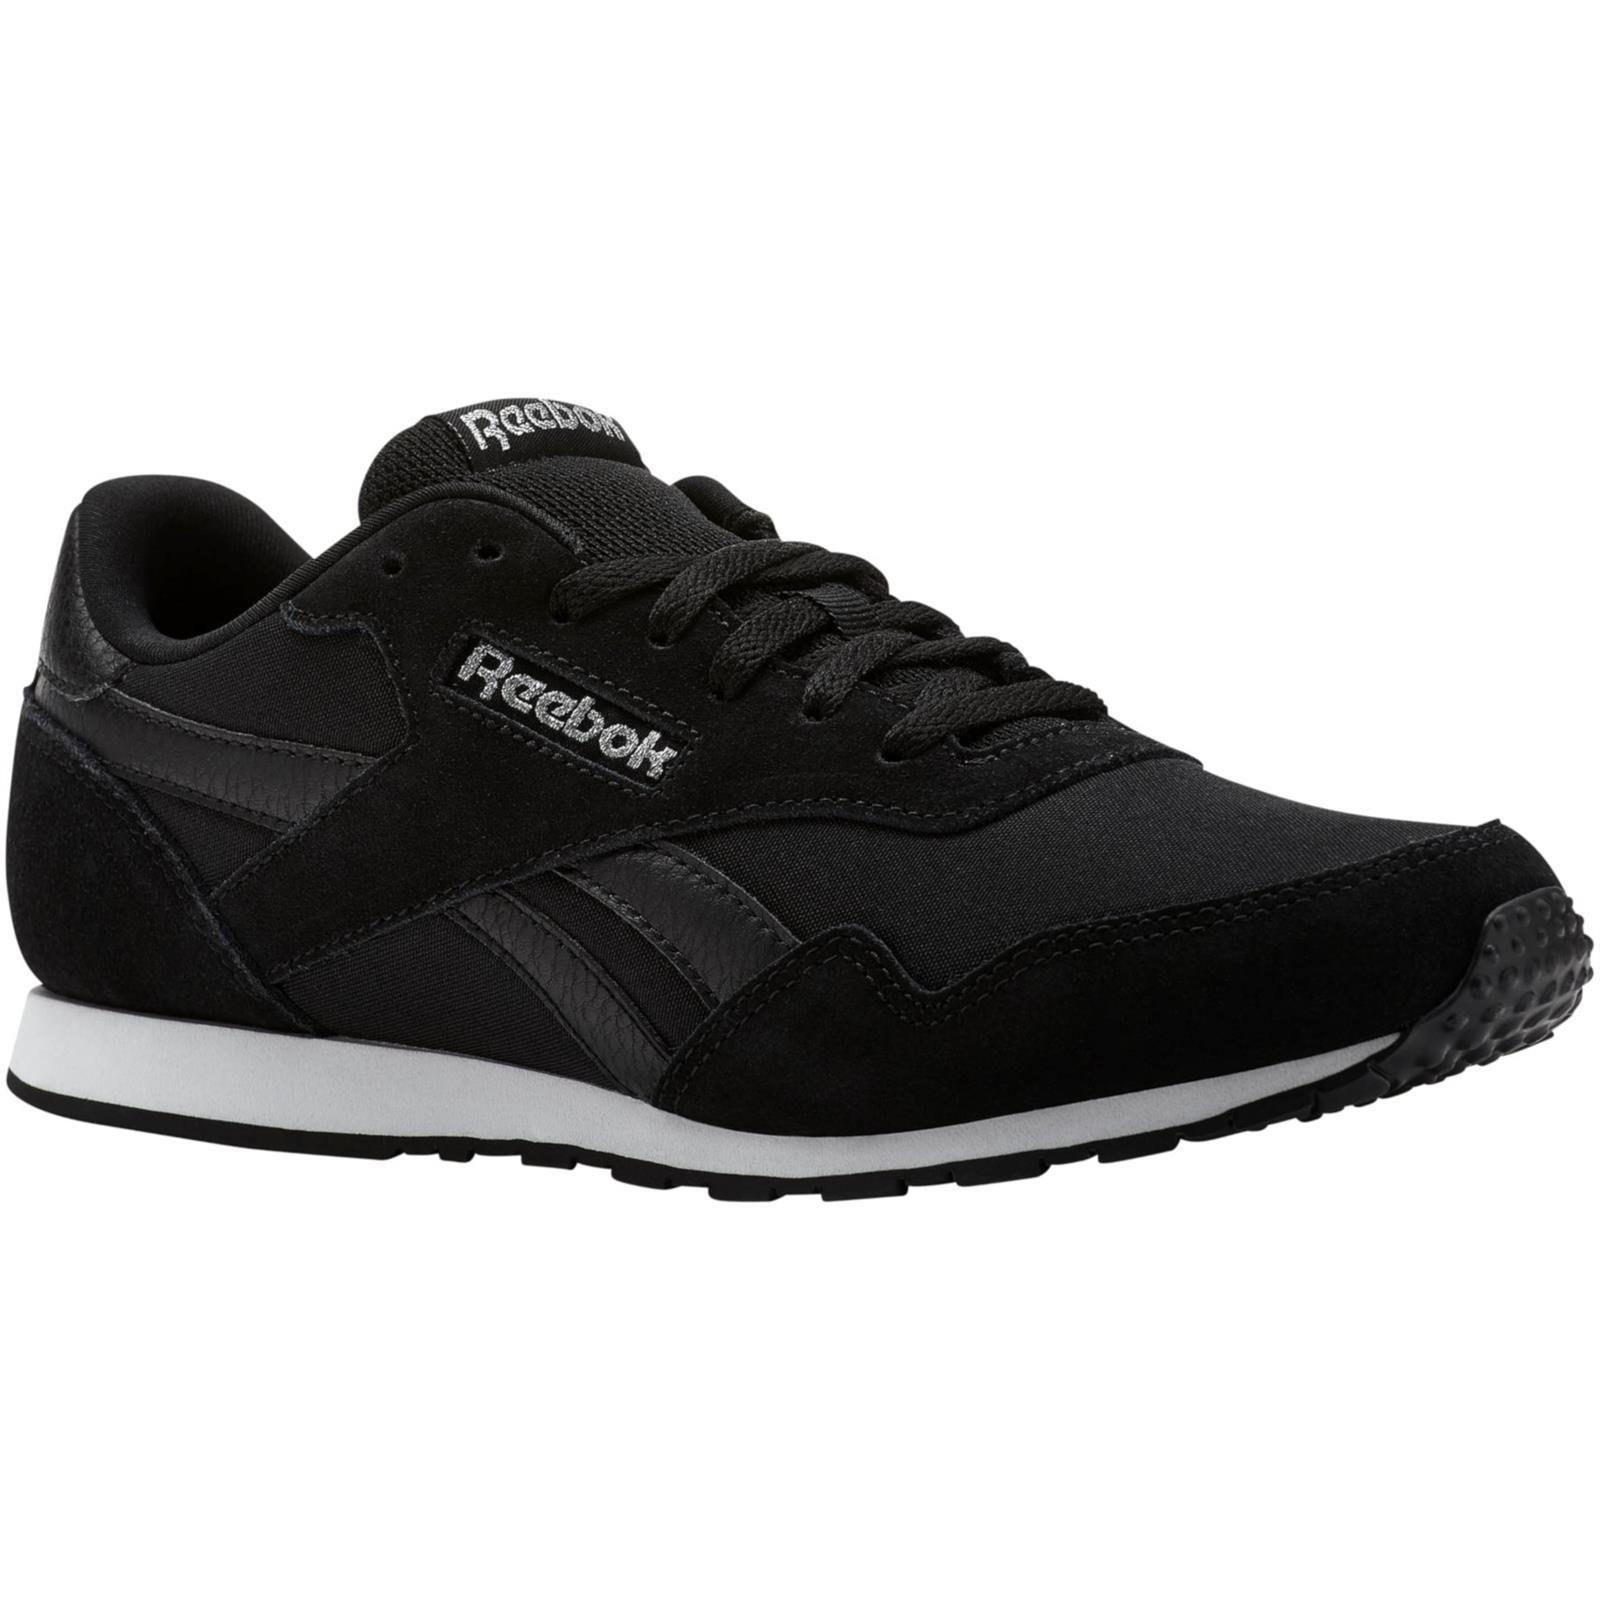 Sports footwear Reebok CN3170 ROYAL ULTRA SL BLACK